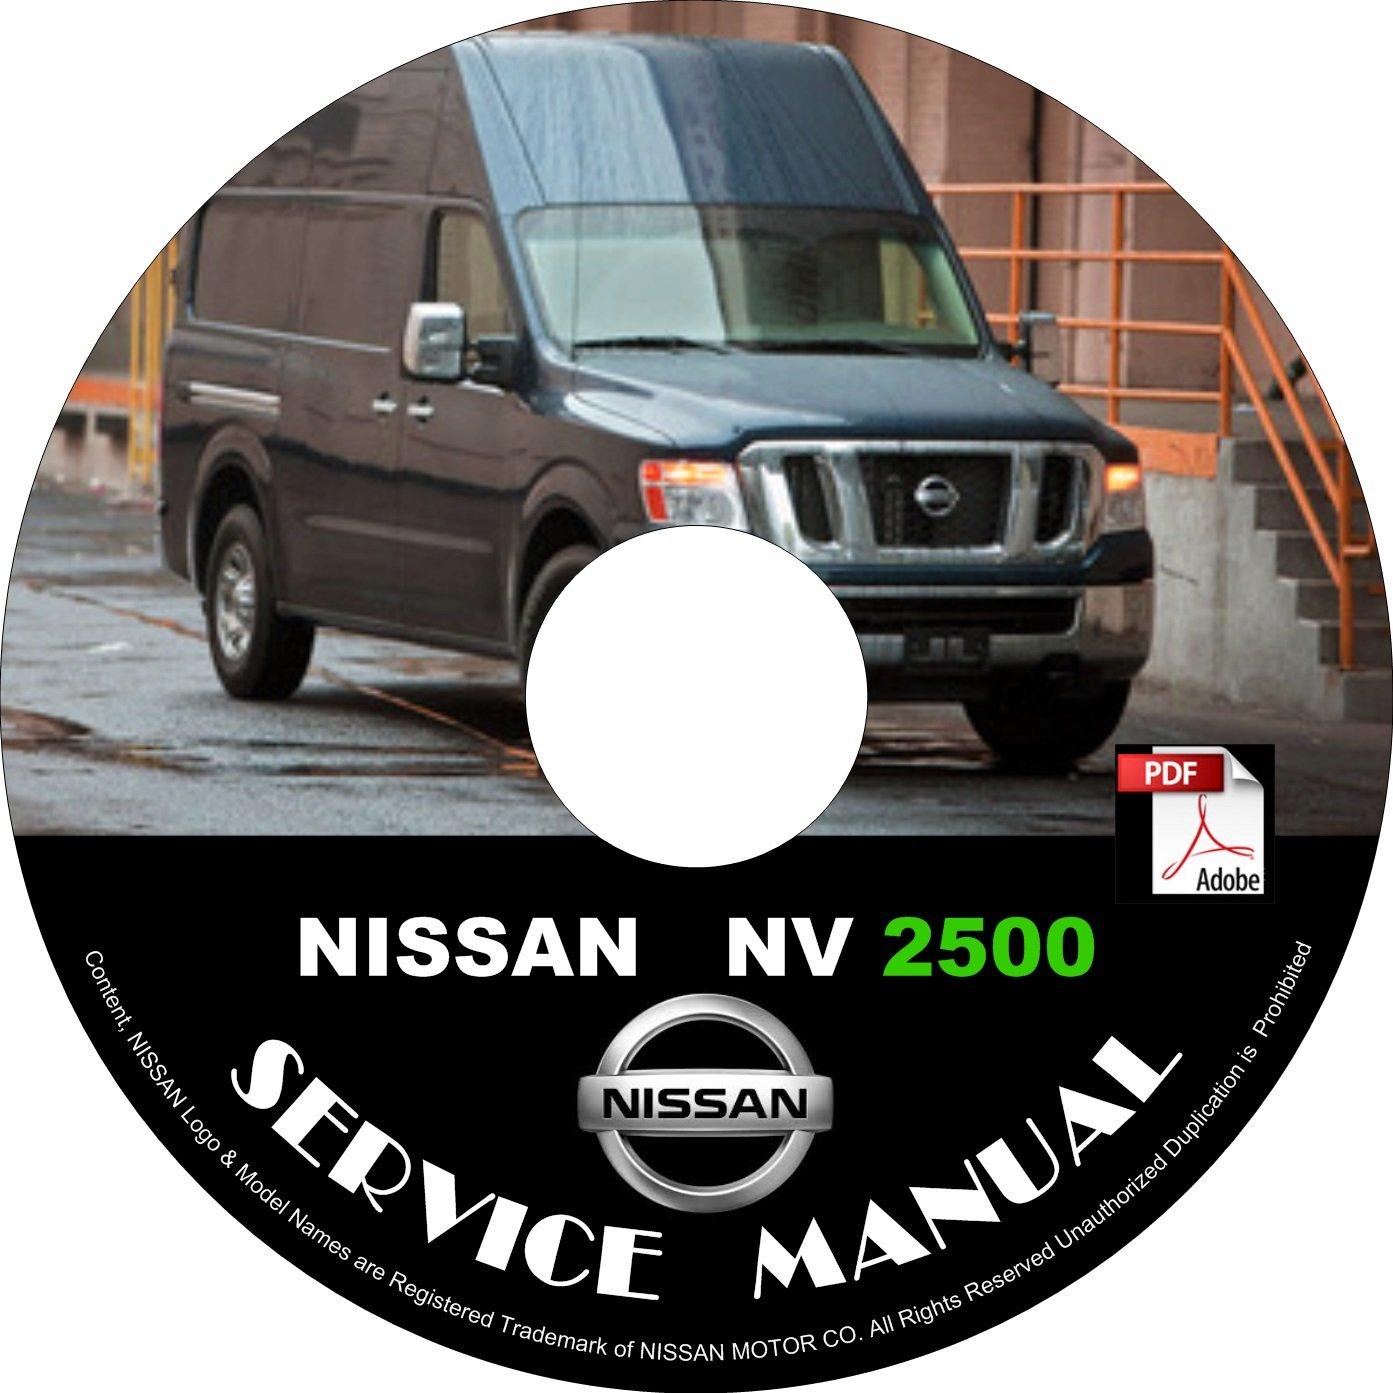 2014 Nissan NV 2500 Factory Service Repair Shop Manual On